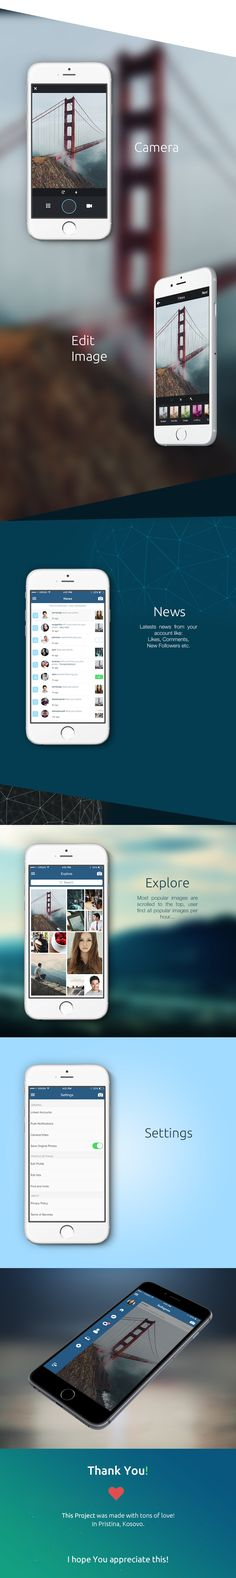 Instagram Redesign on Behance